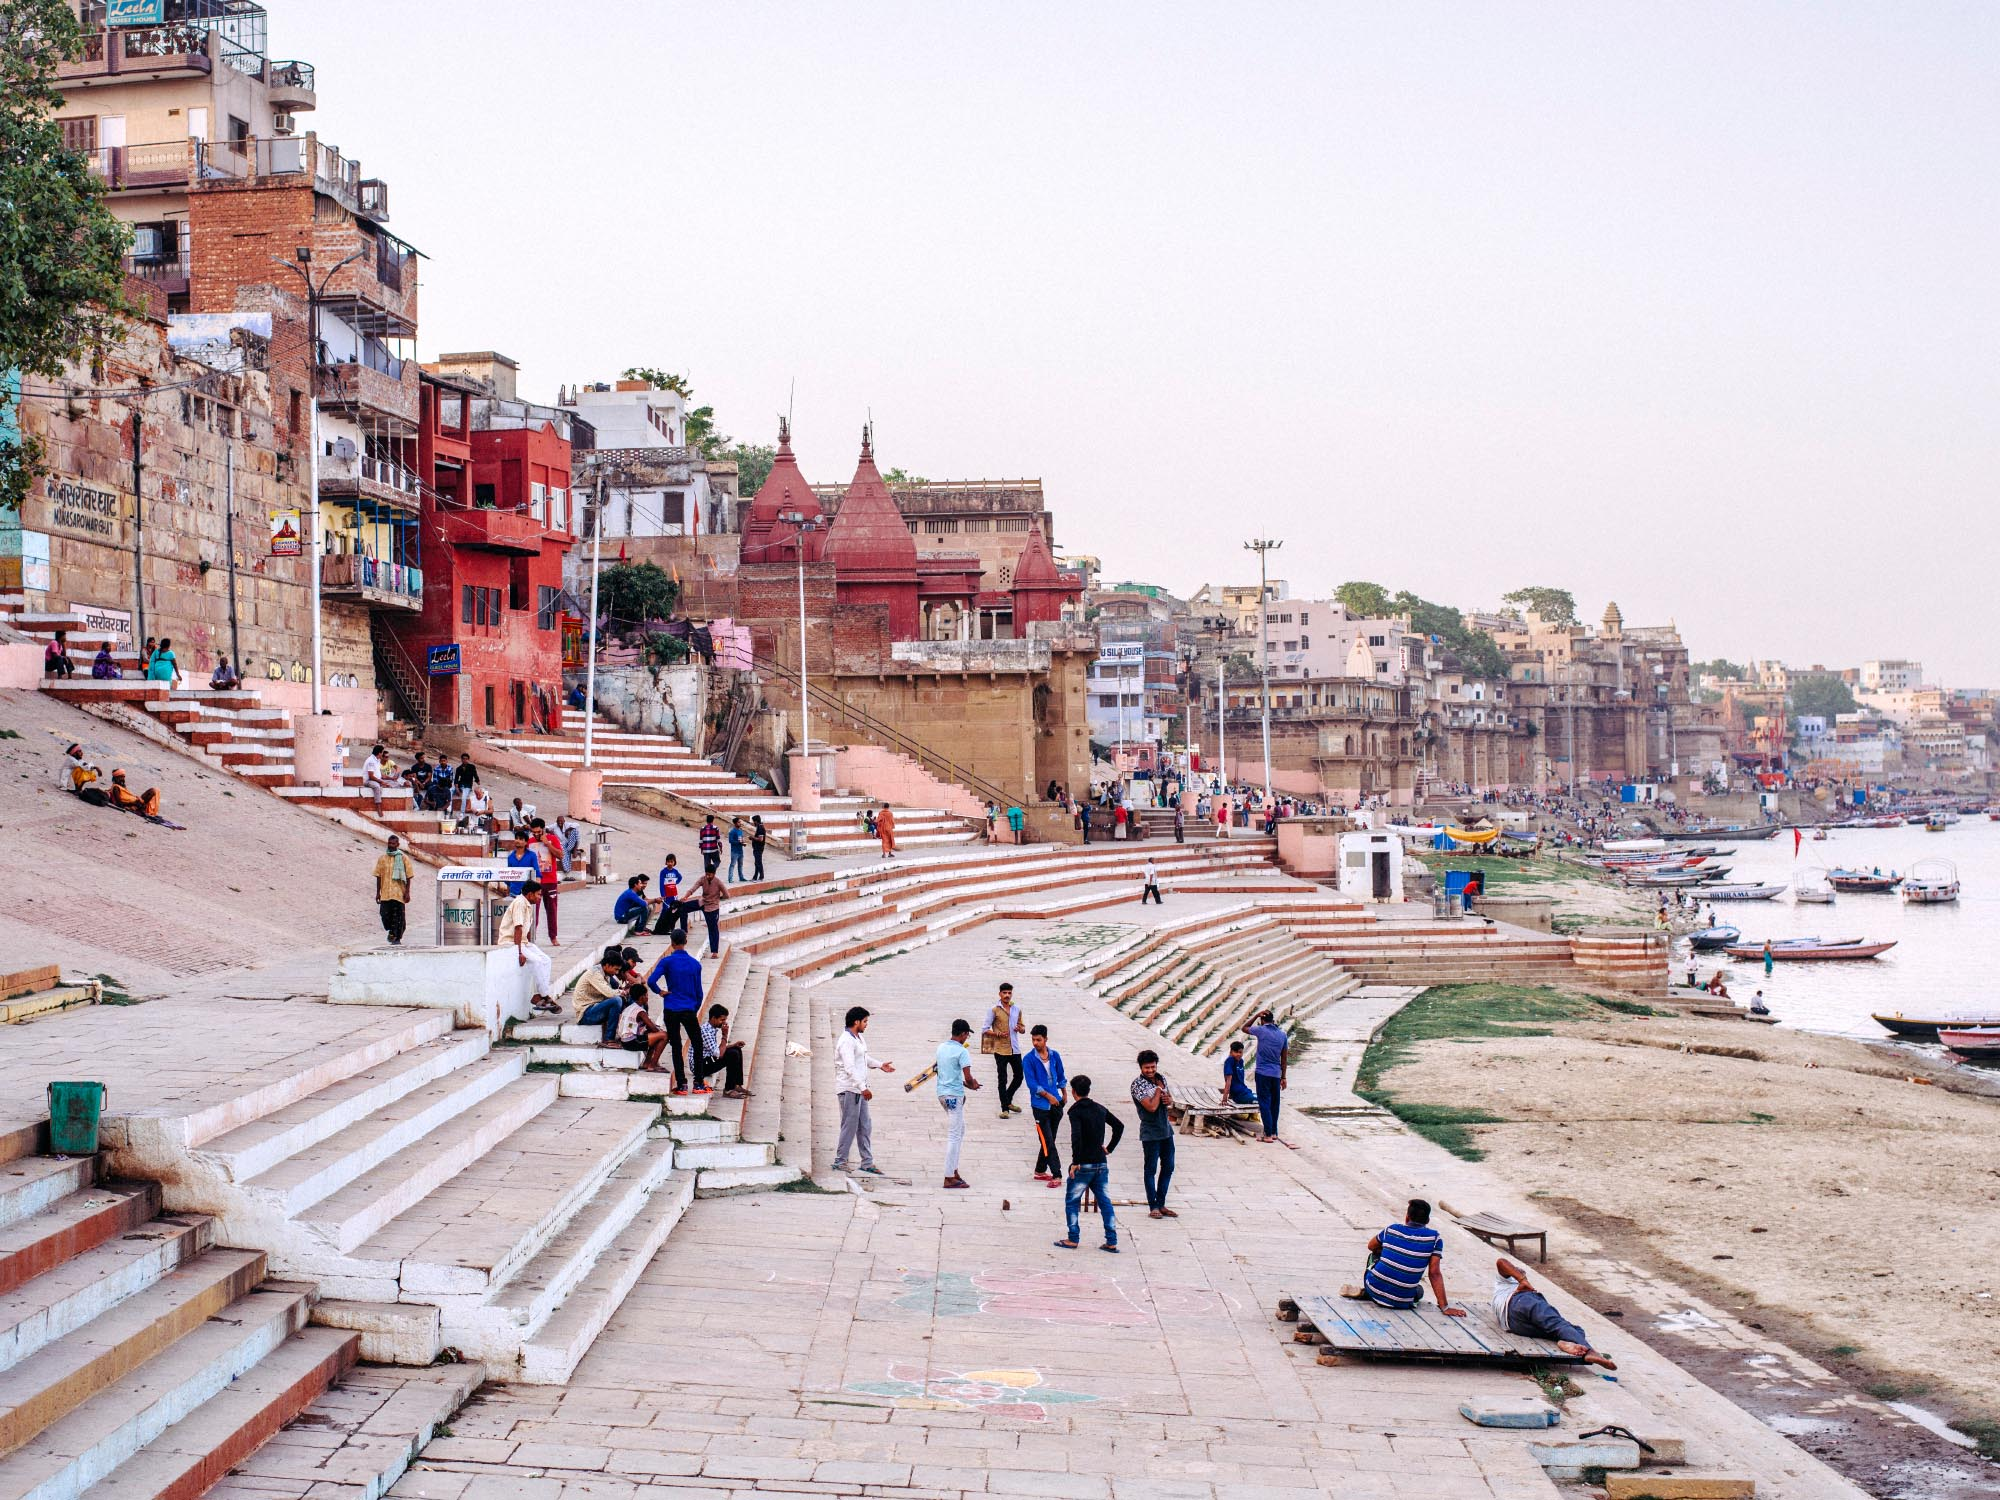 The Ghats of Varanasi.